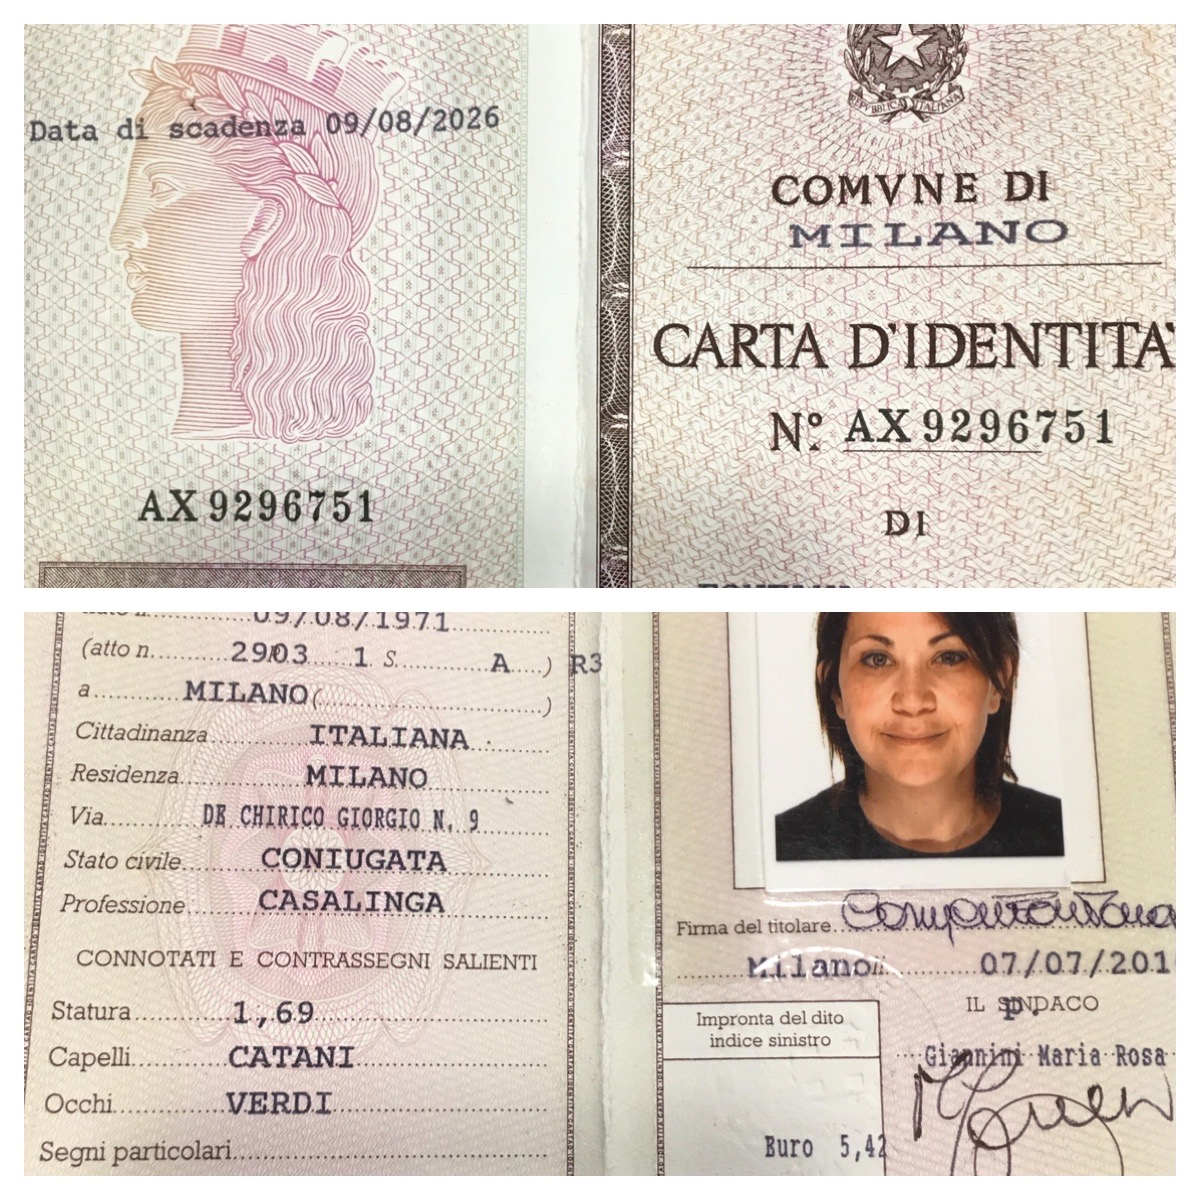 cartaidentita_carmen